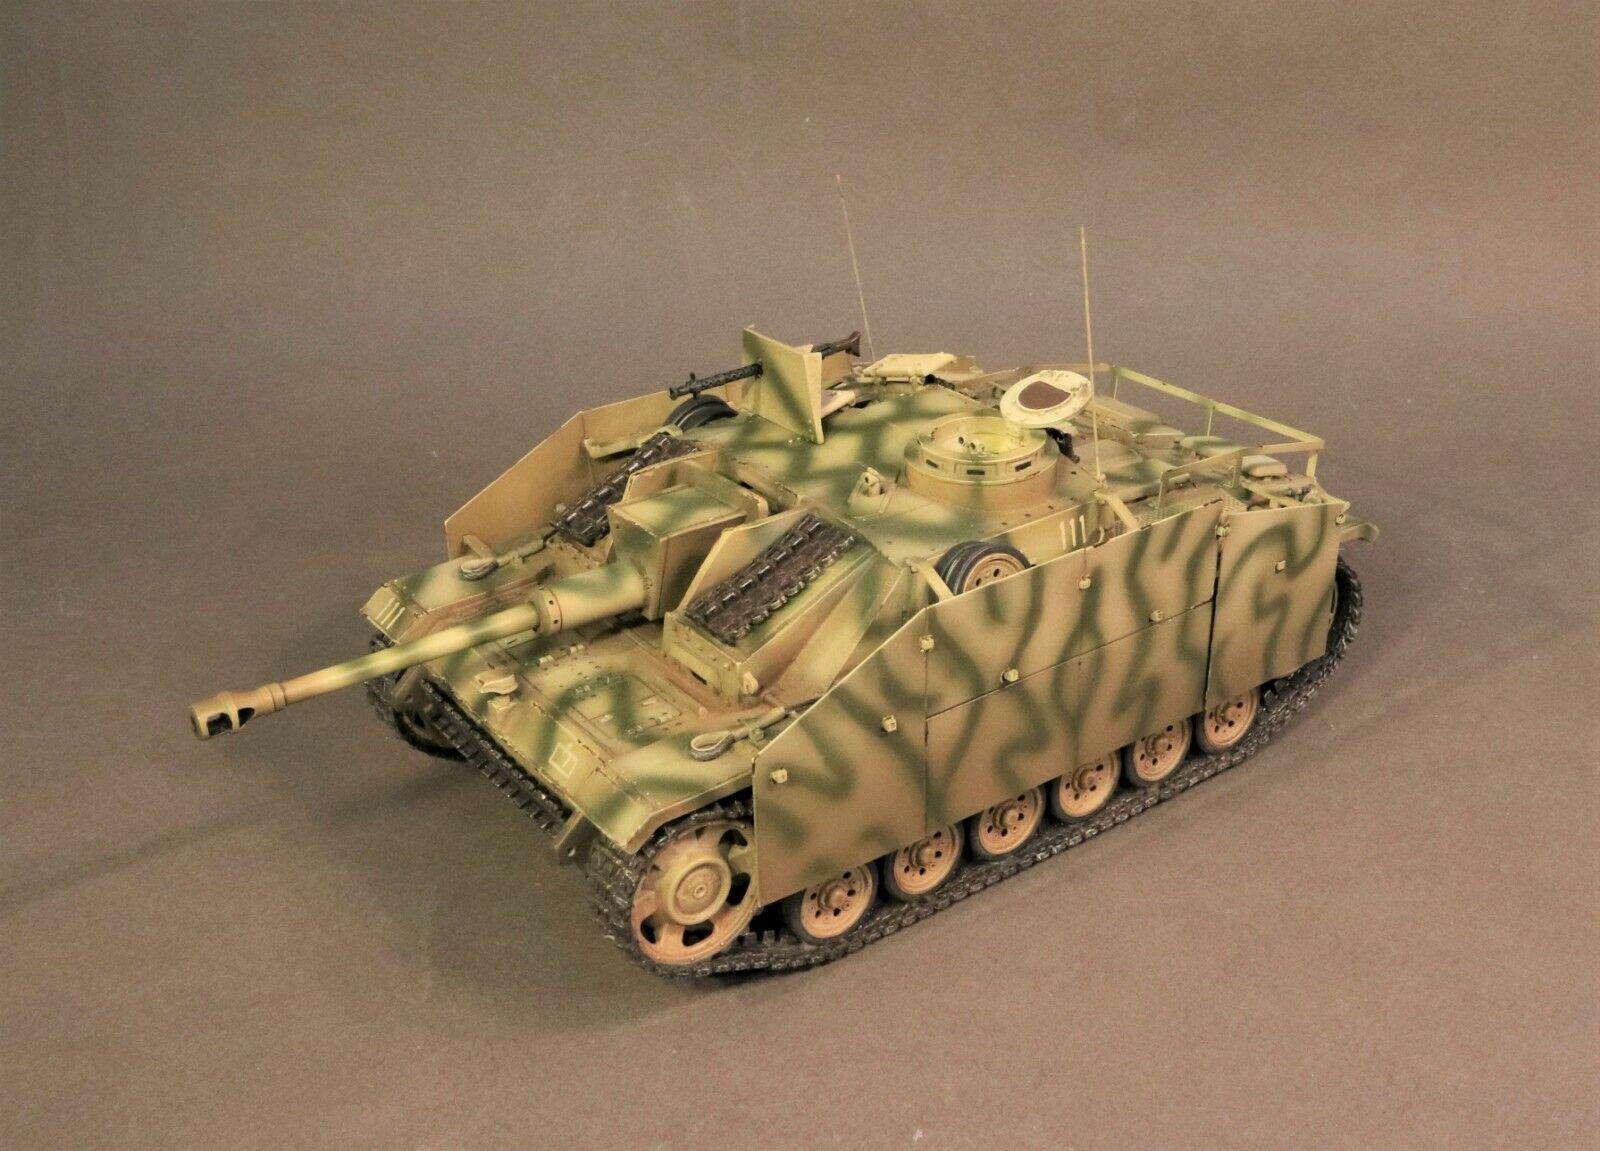 JOHN JENKINS WW2 GERMAN GA-20 STUG III AUSF. G TANK SET MIB